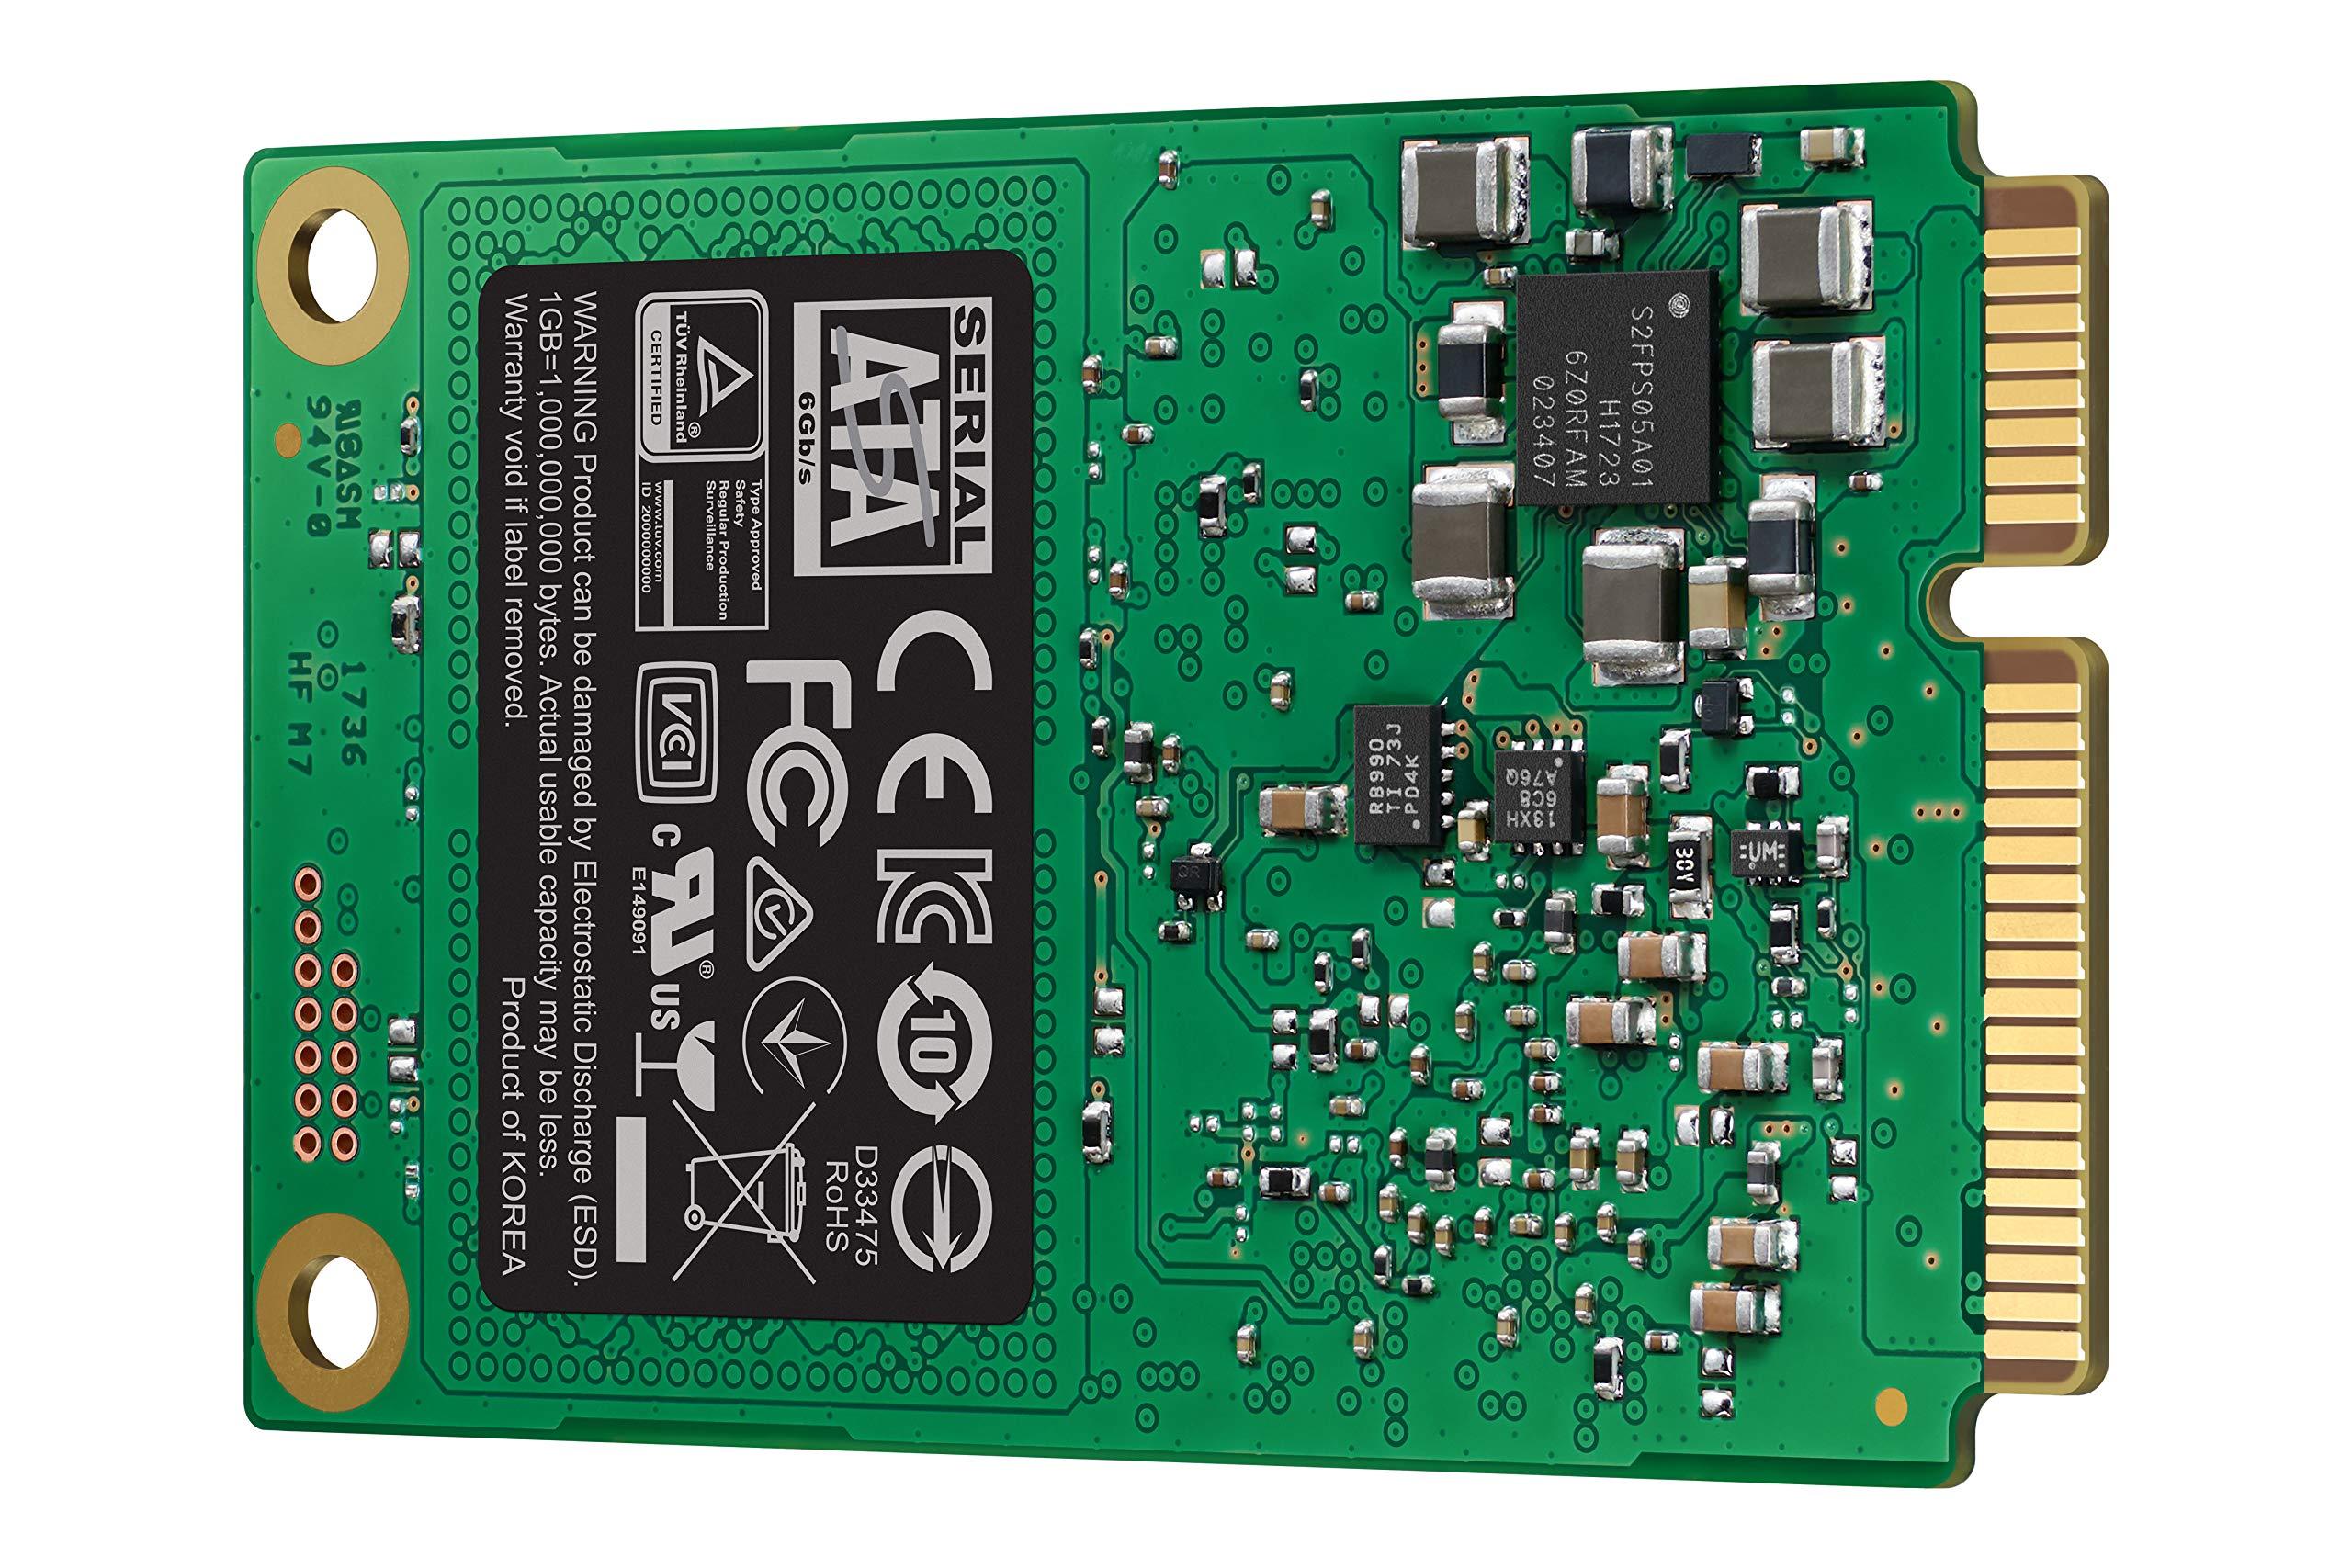 Samsung SSD 860 EVO 1TB mSATA Internal SSD (MZ-M6E1T0BW) by Samsung (Image #2)